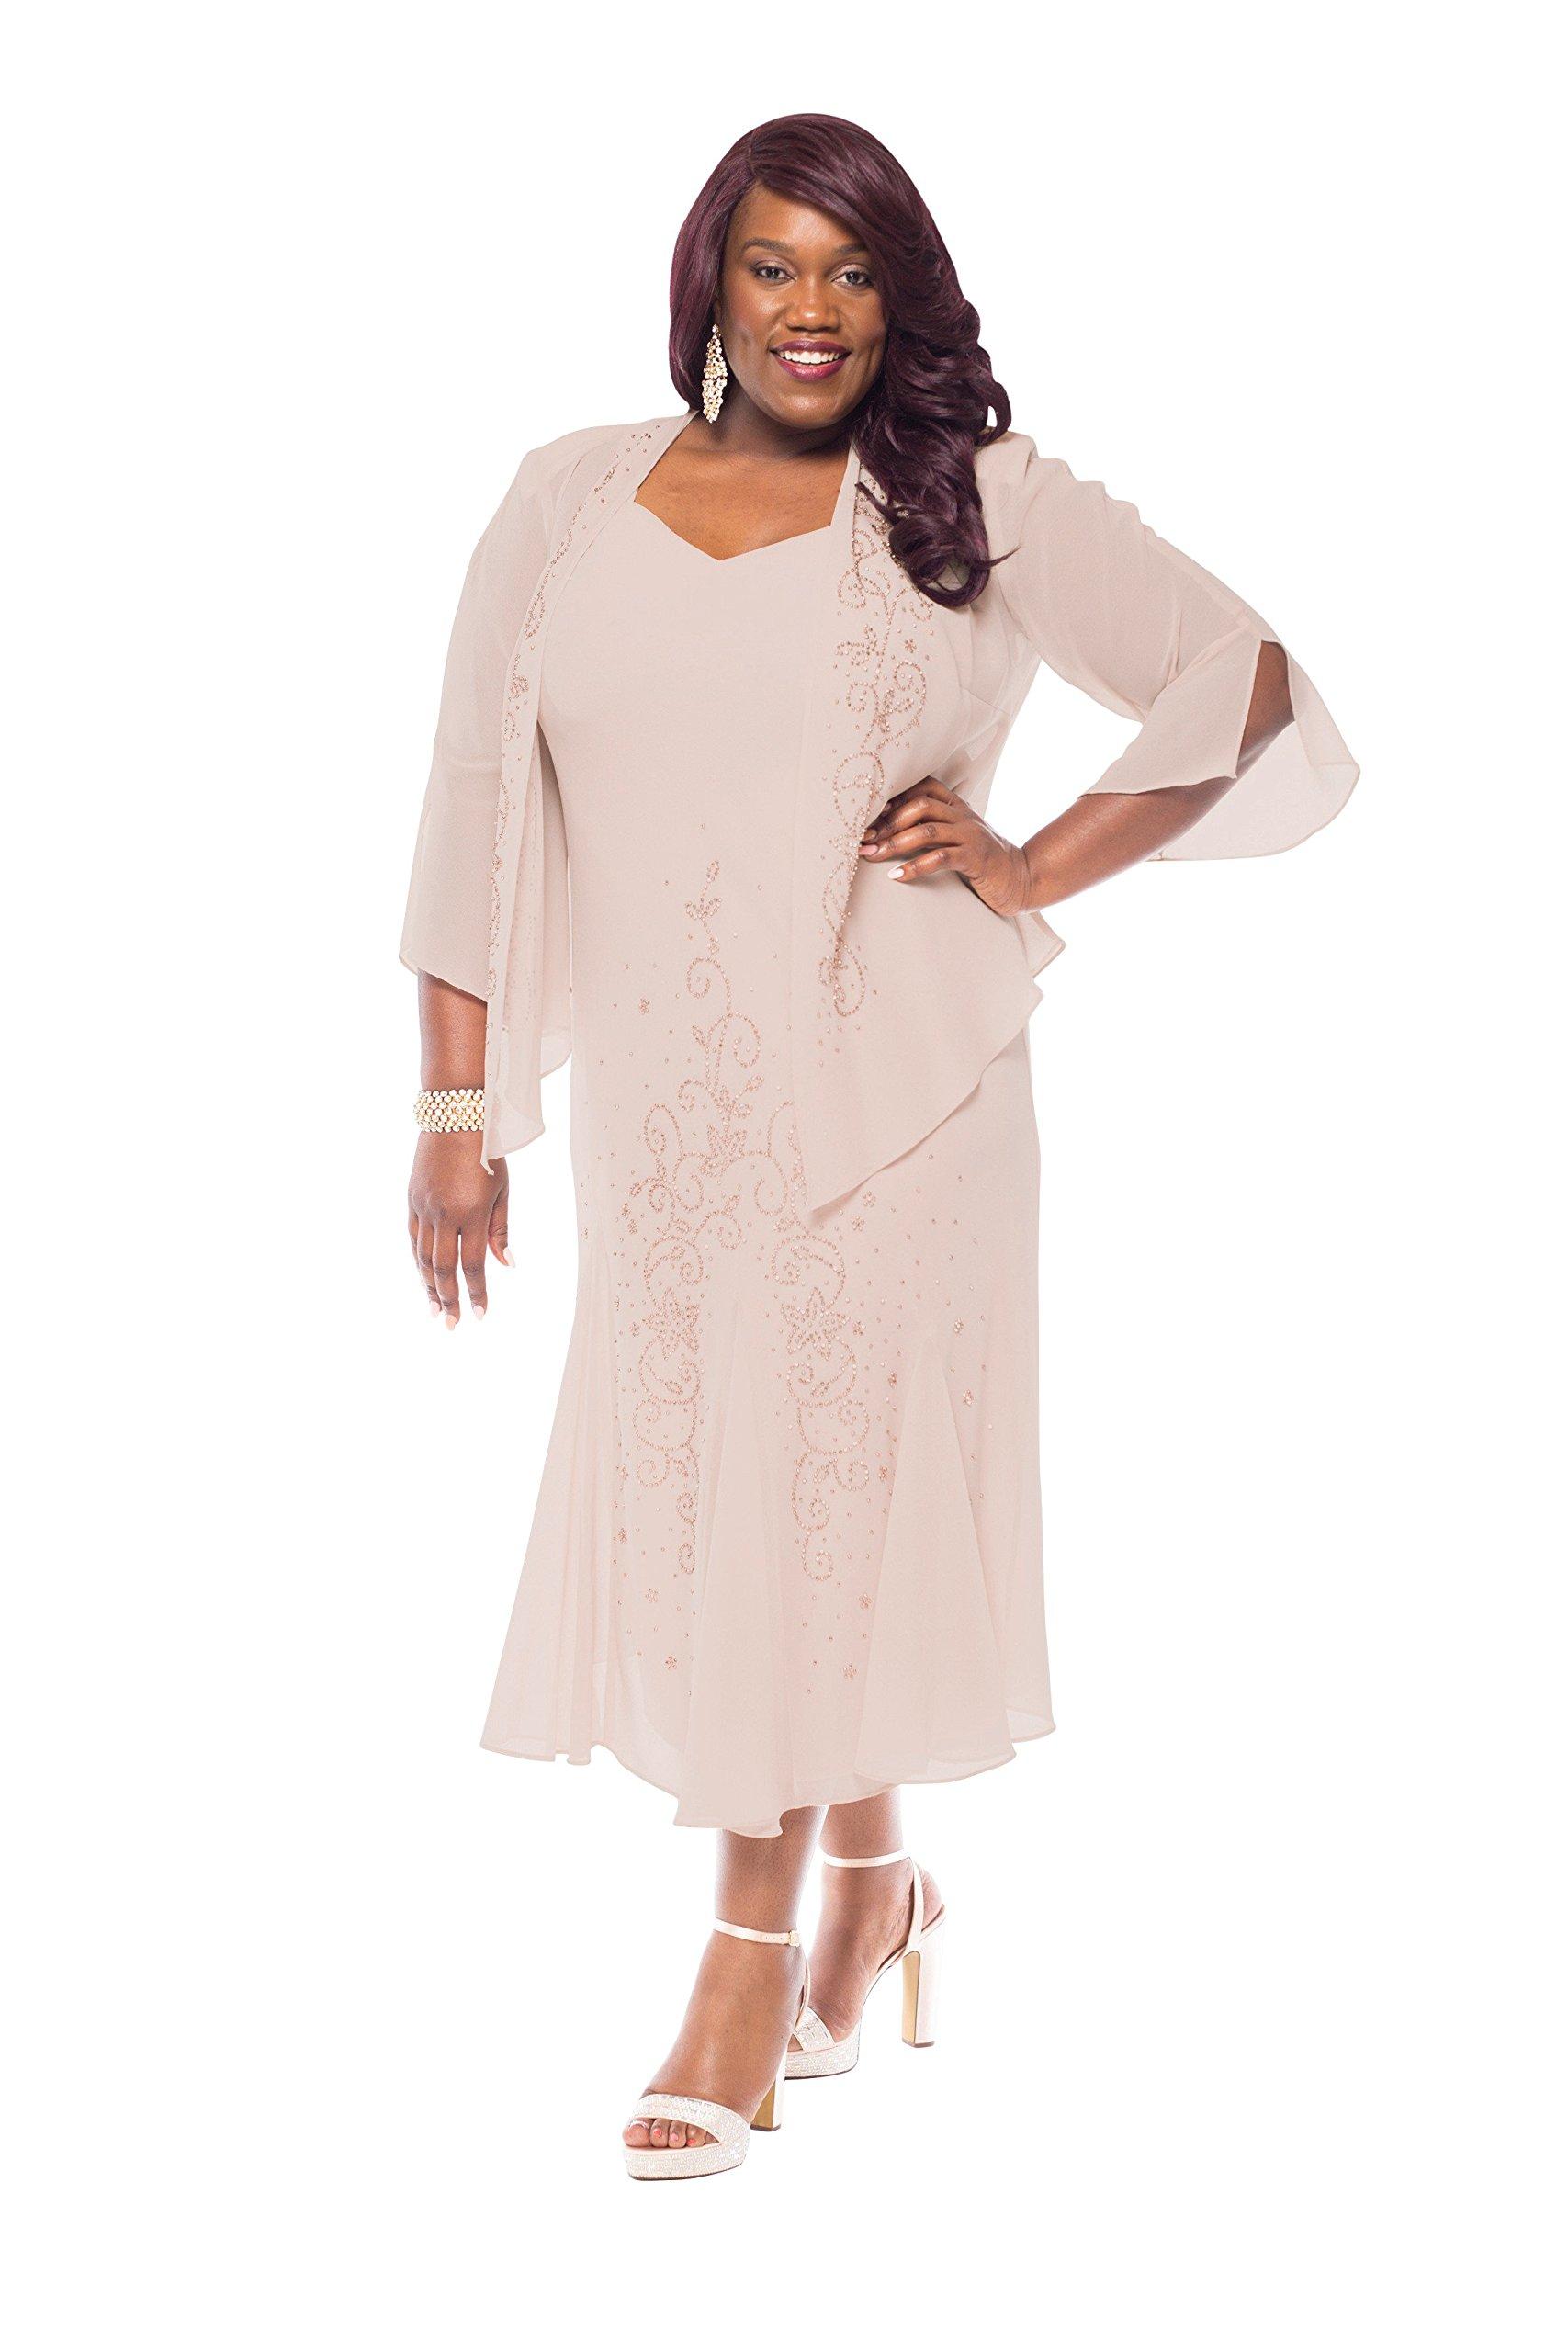 R&M Richards Women's Plus Size Beaded Jacket Dress - Mother Of The Bride Dresses (18W, Mauve) by R&M Richards